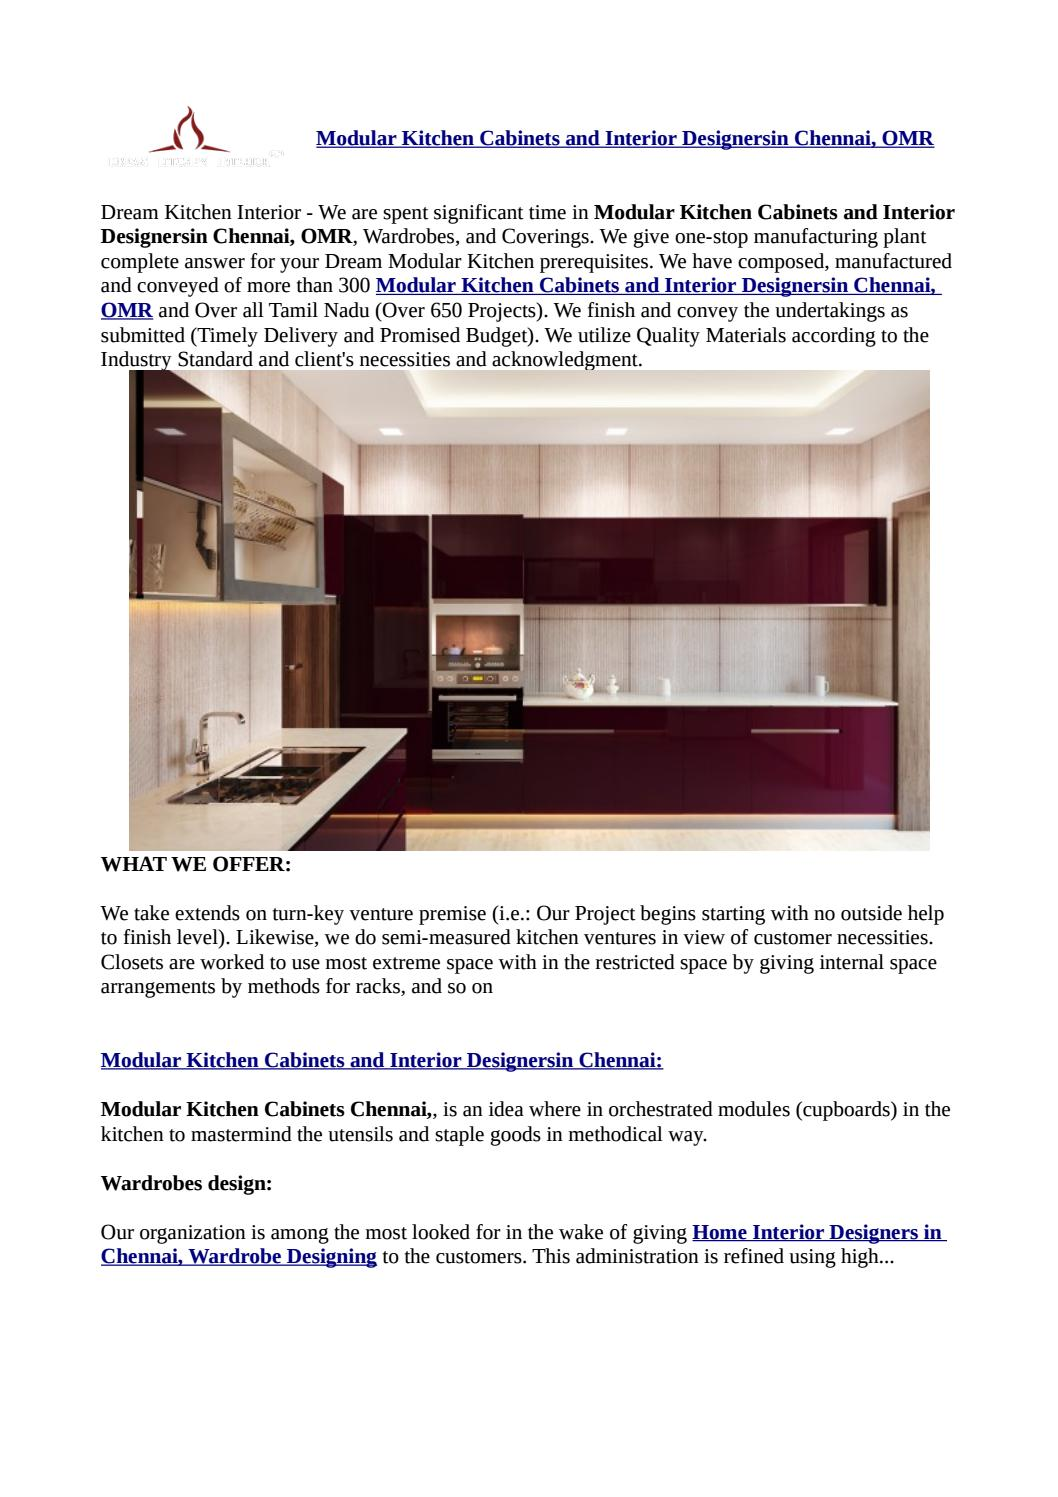 Modular Kitchen Cabinets And Interior Designersin Chennai Omr By Justseemobileapp Issuu